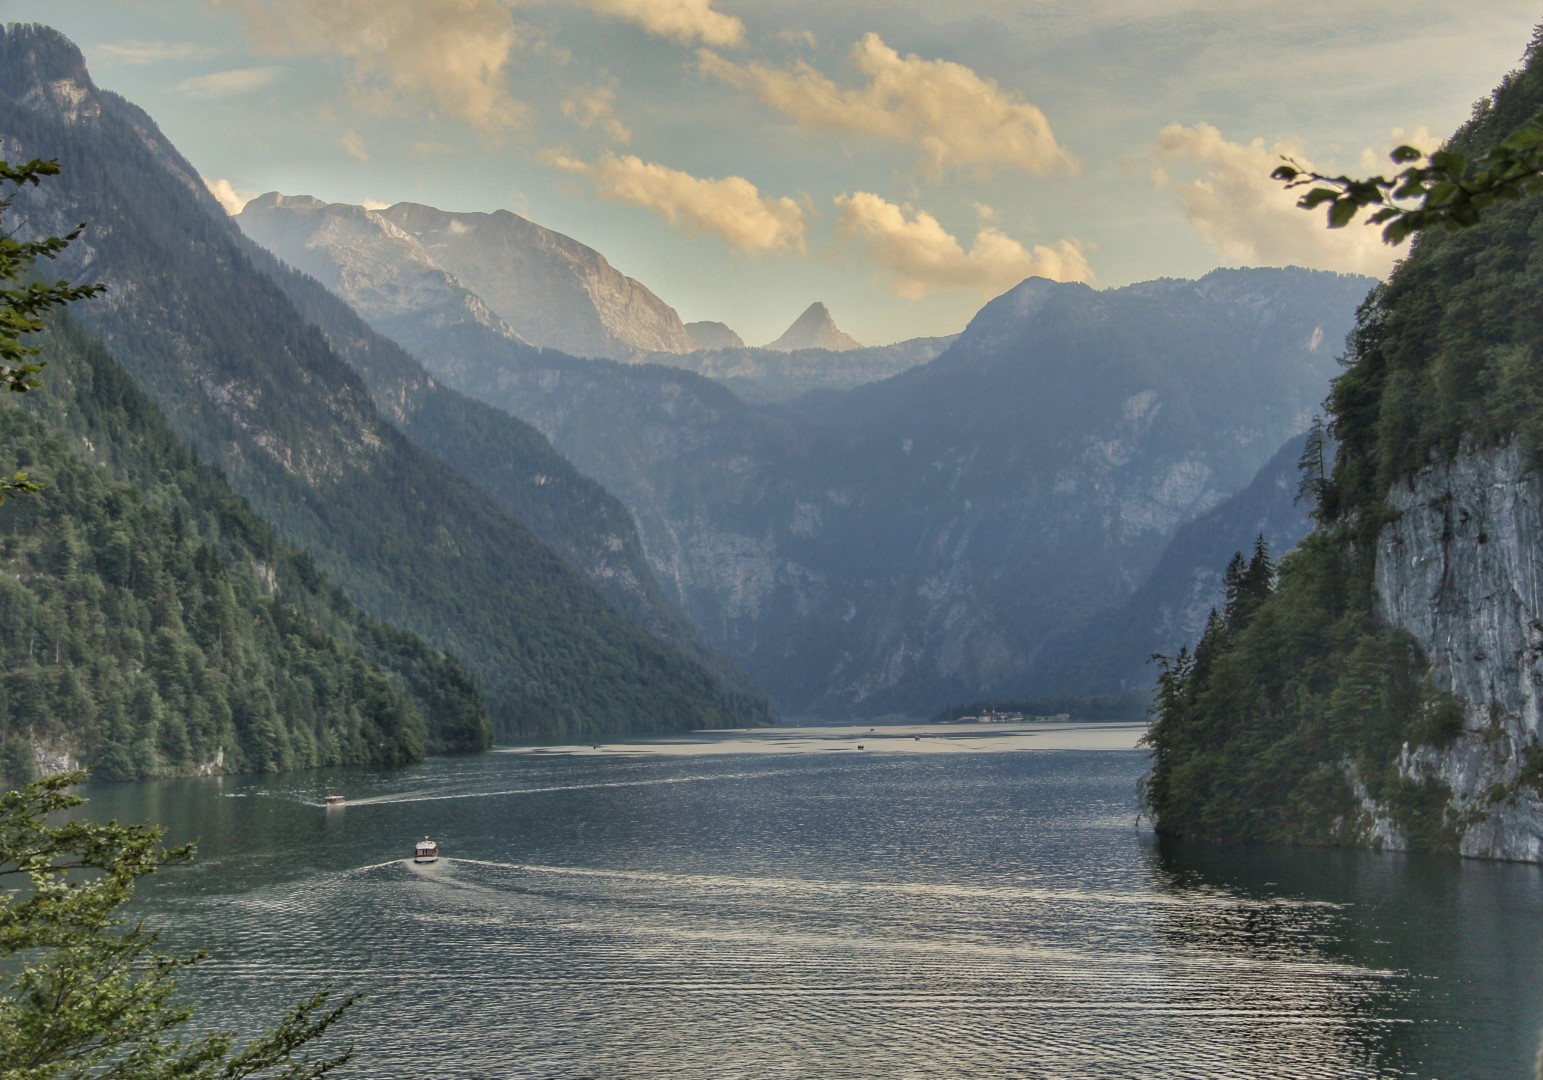 munich to berchtesgaden day trip